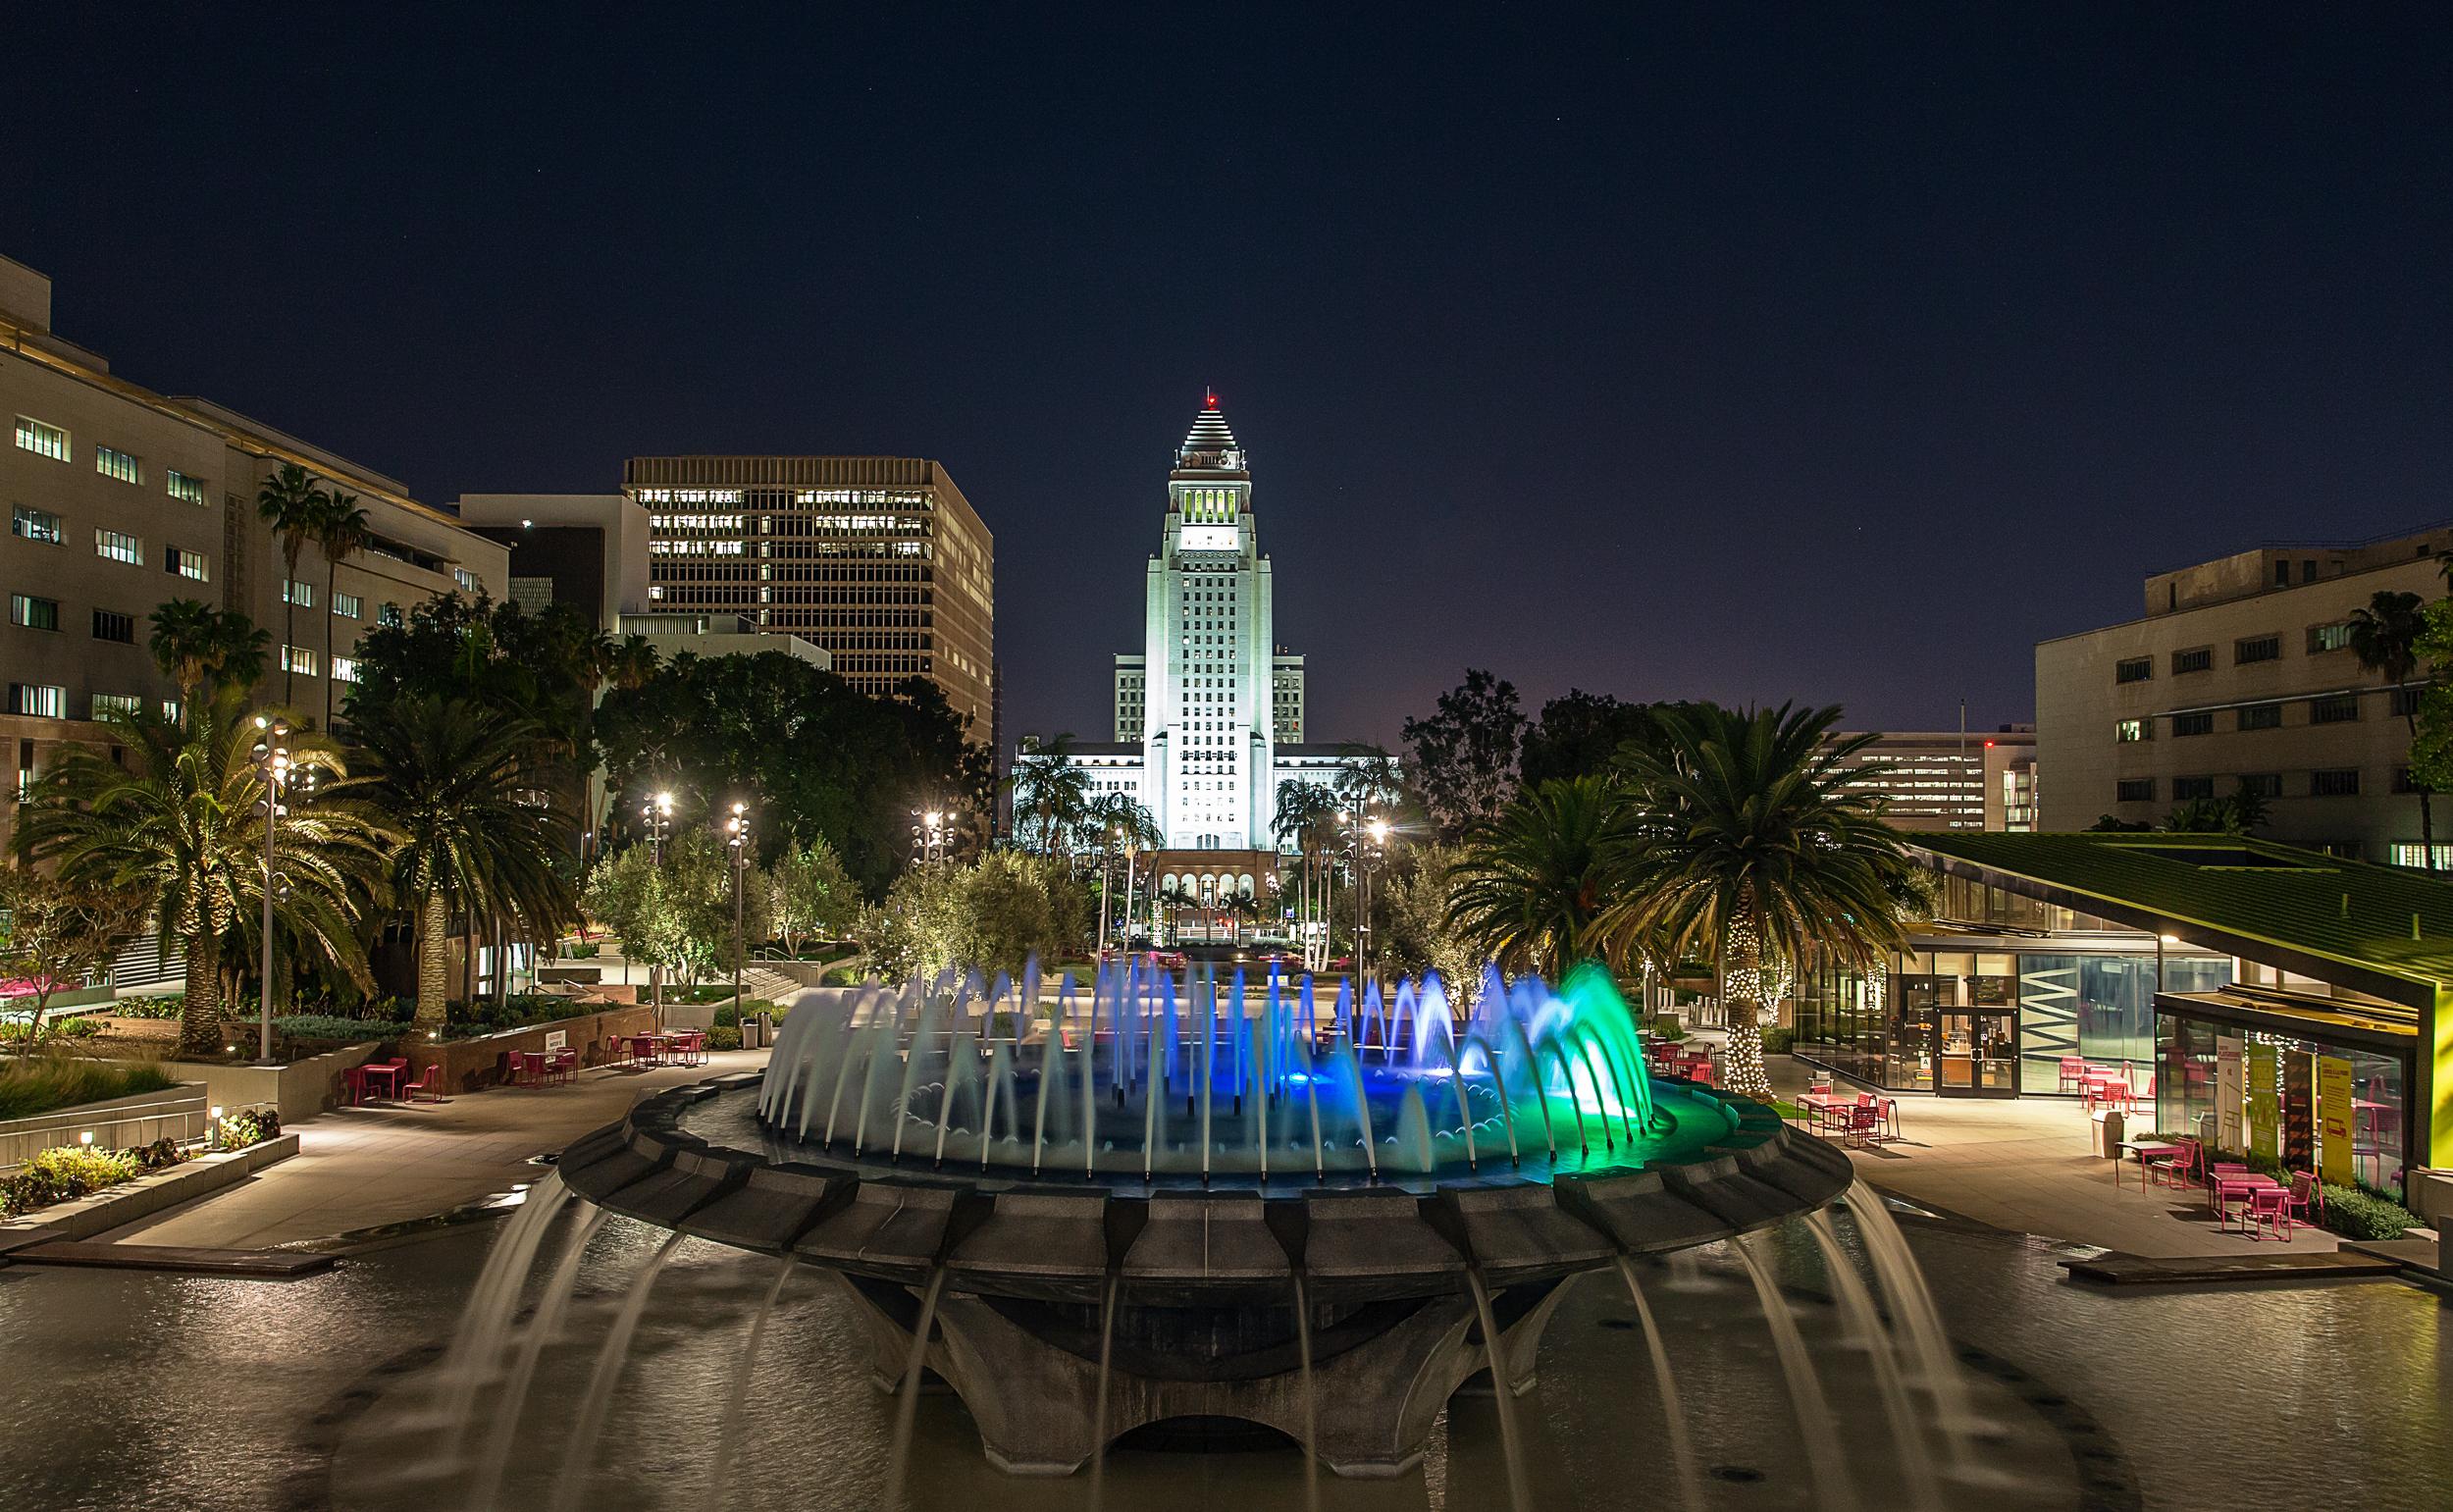 Chacon Images_LA_Travel_WEB_-6692.jpg